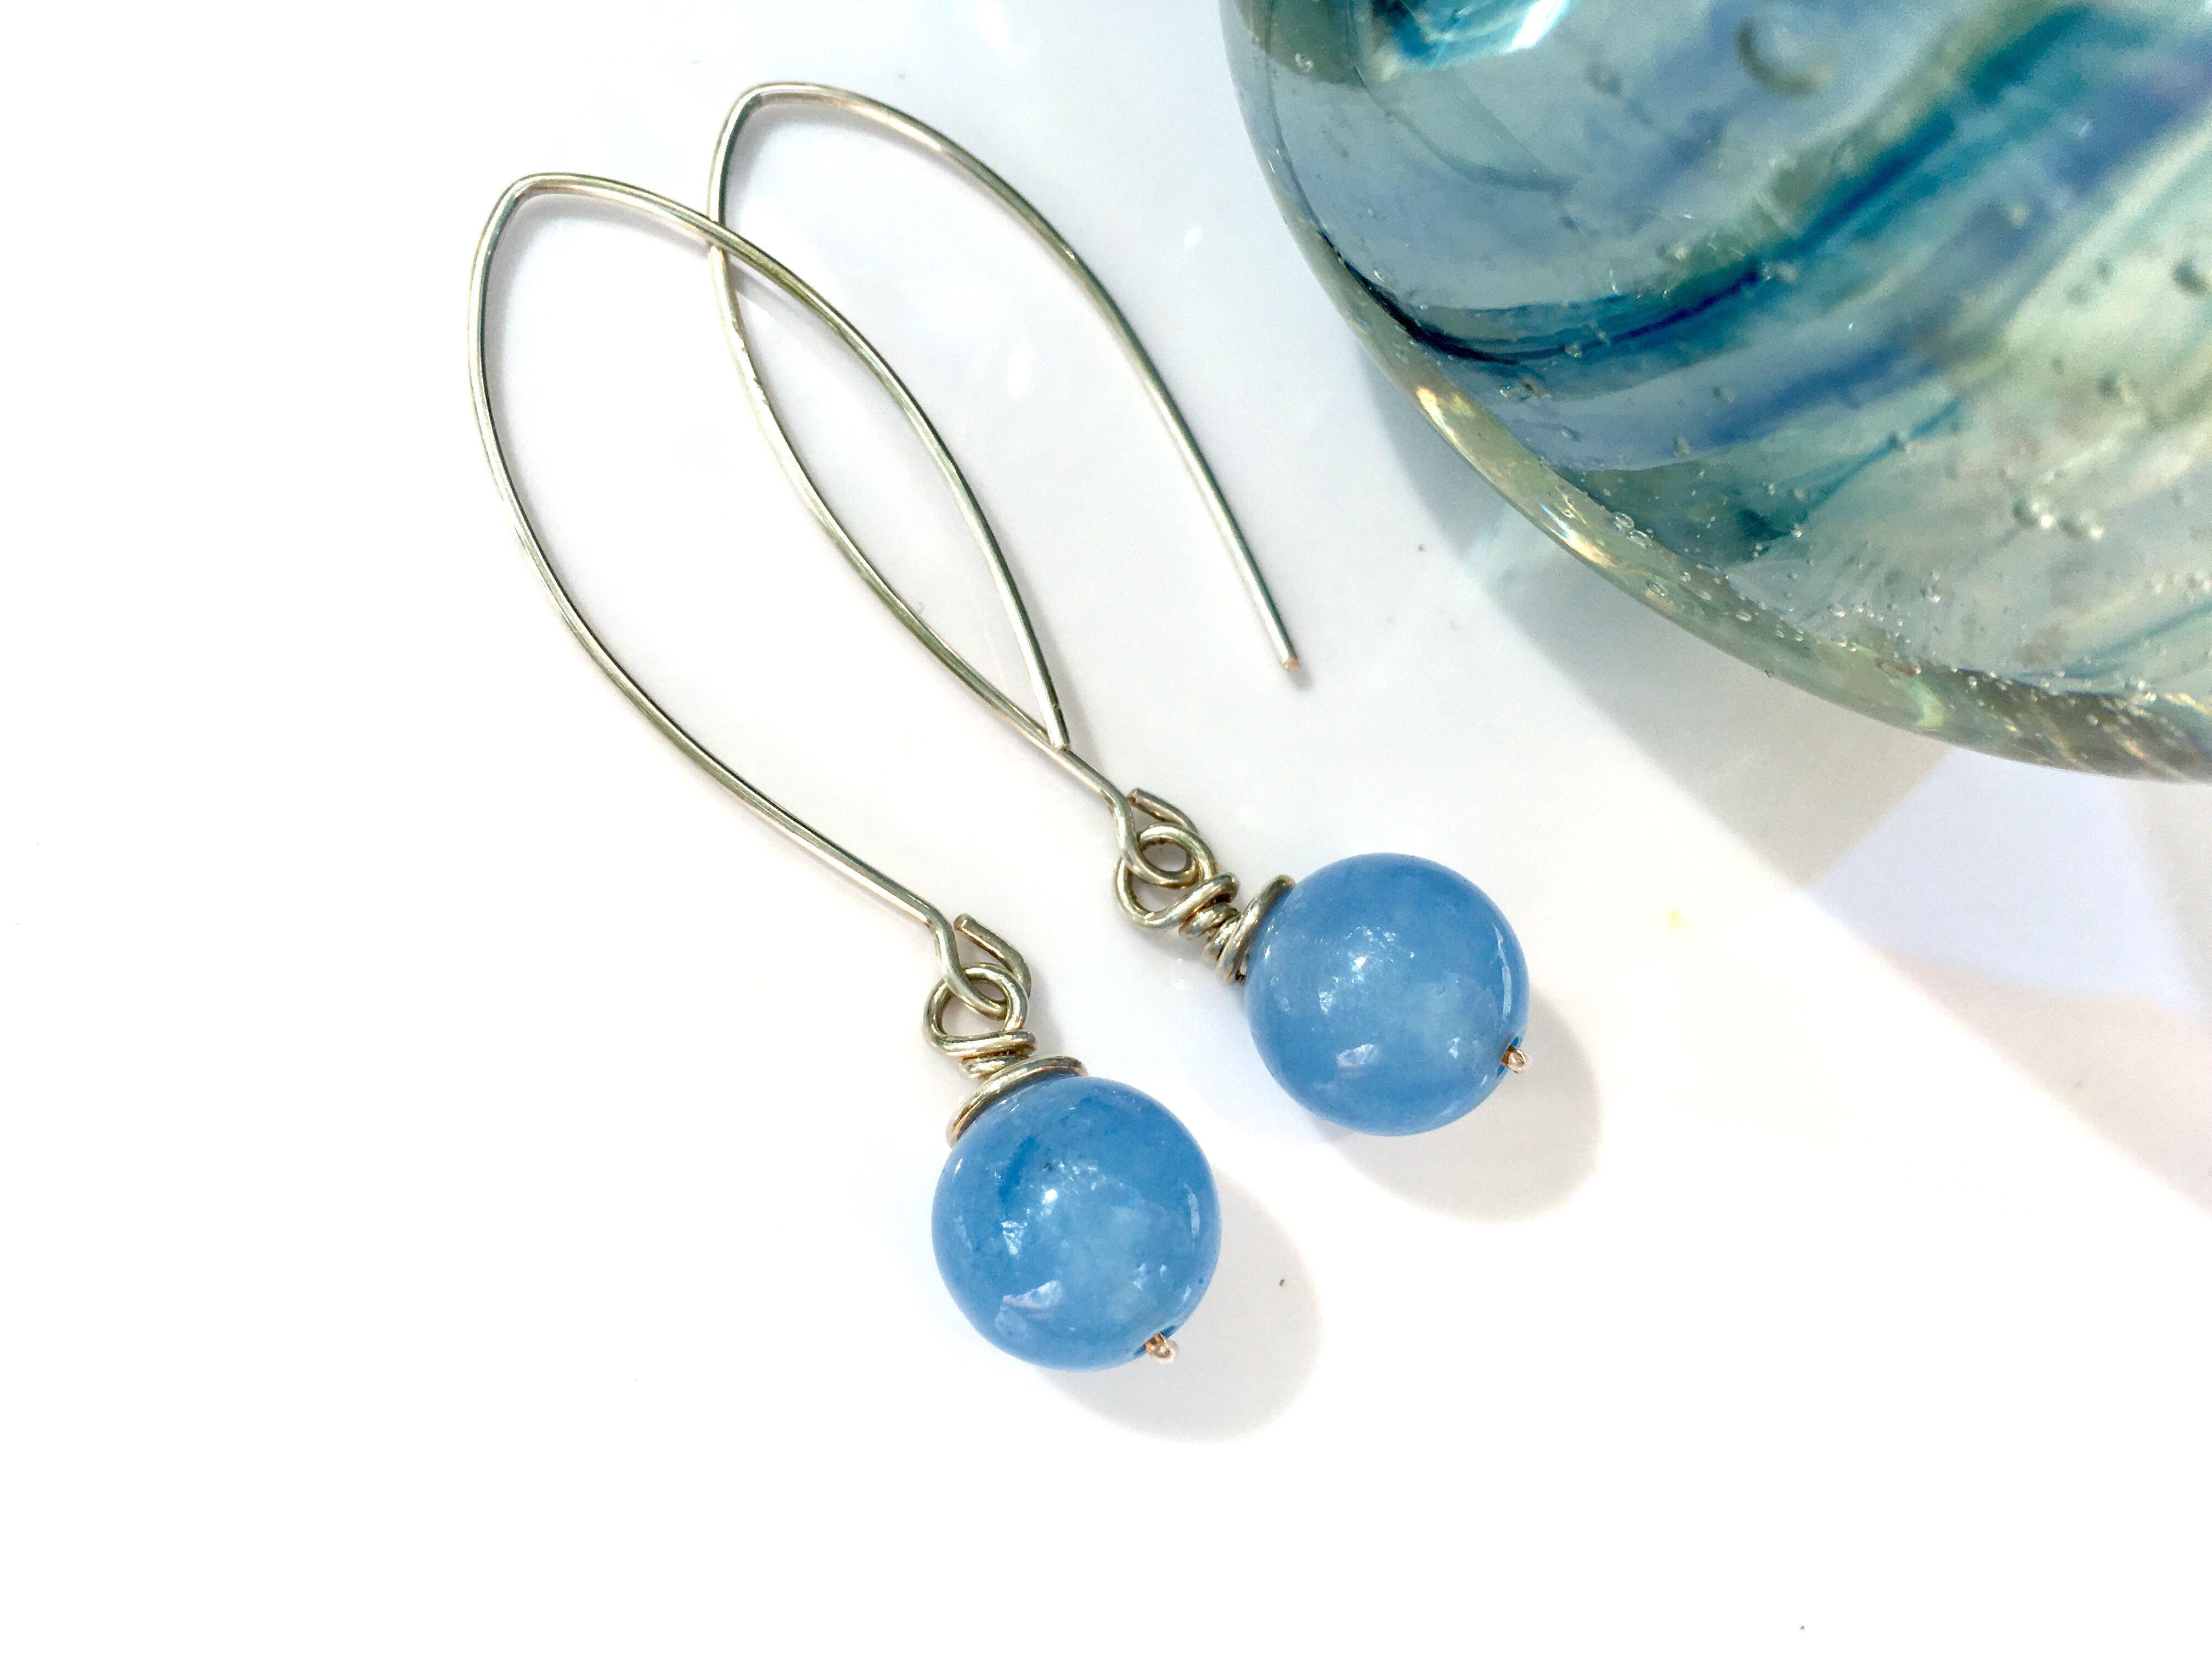 Sky blues & sterling silver handmade. A bridesmaid's keepsake! https://img1.etsystatic.com/103/2/8965783/il_fullxfull.1044179365_2226.jpg #etsymntt #bridedmaid #weddingjewelry